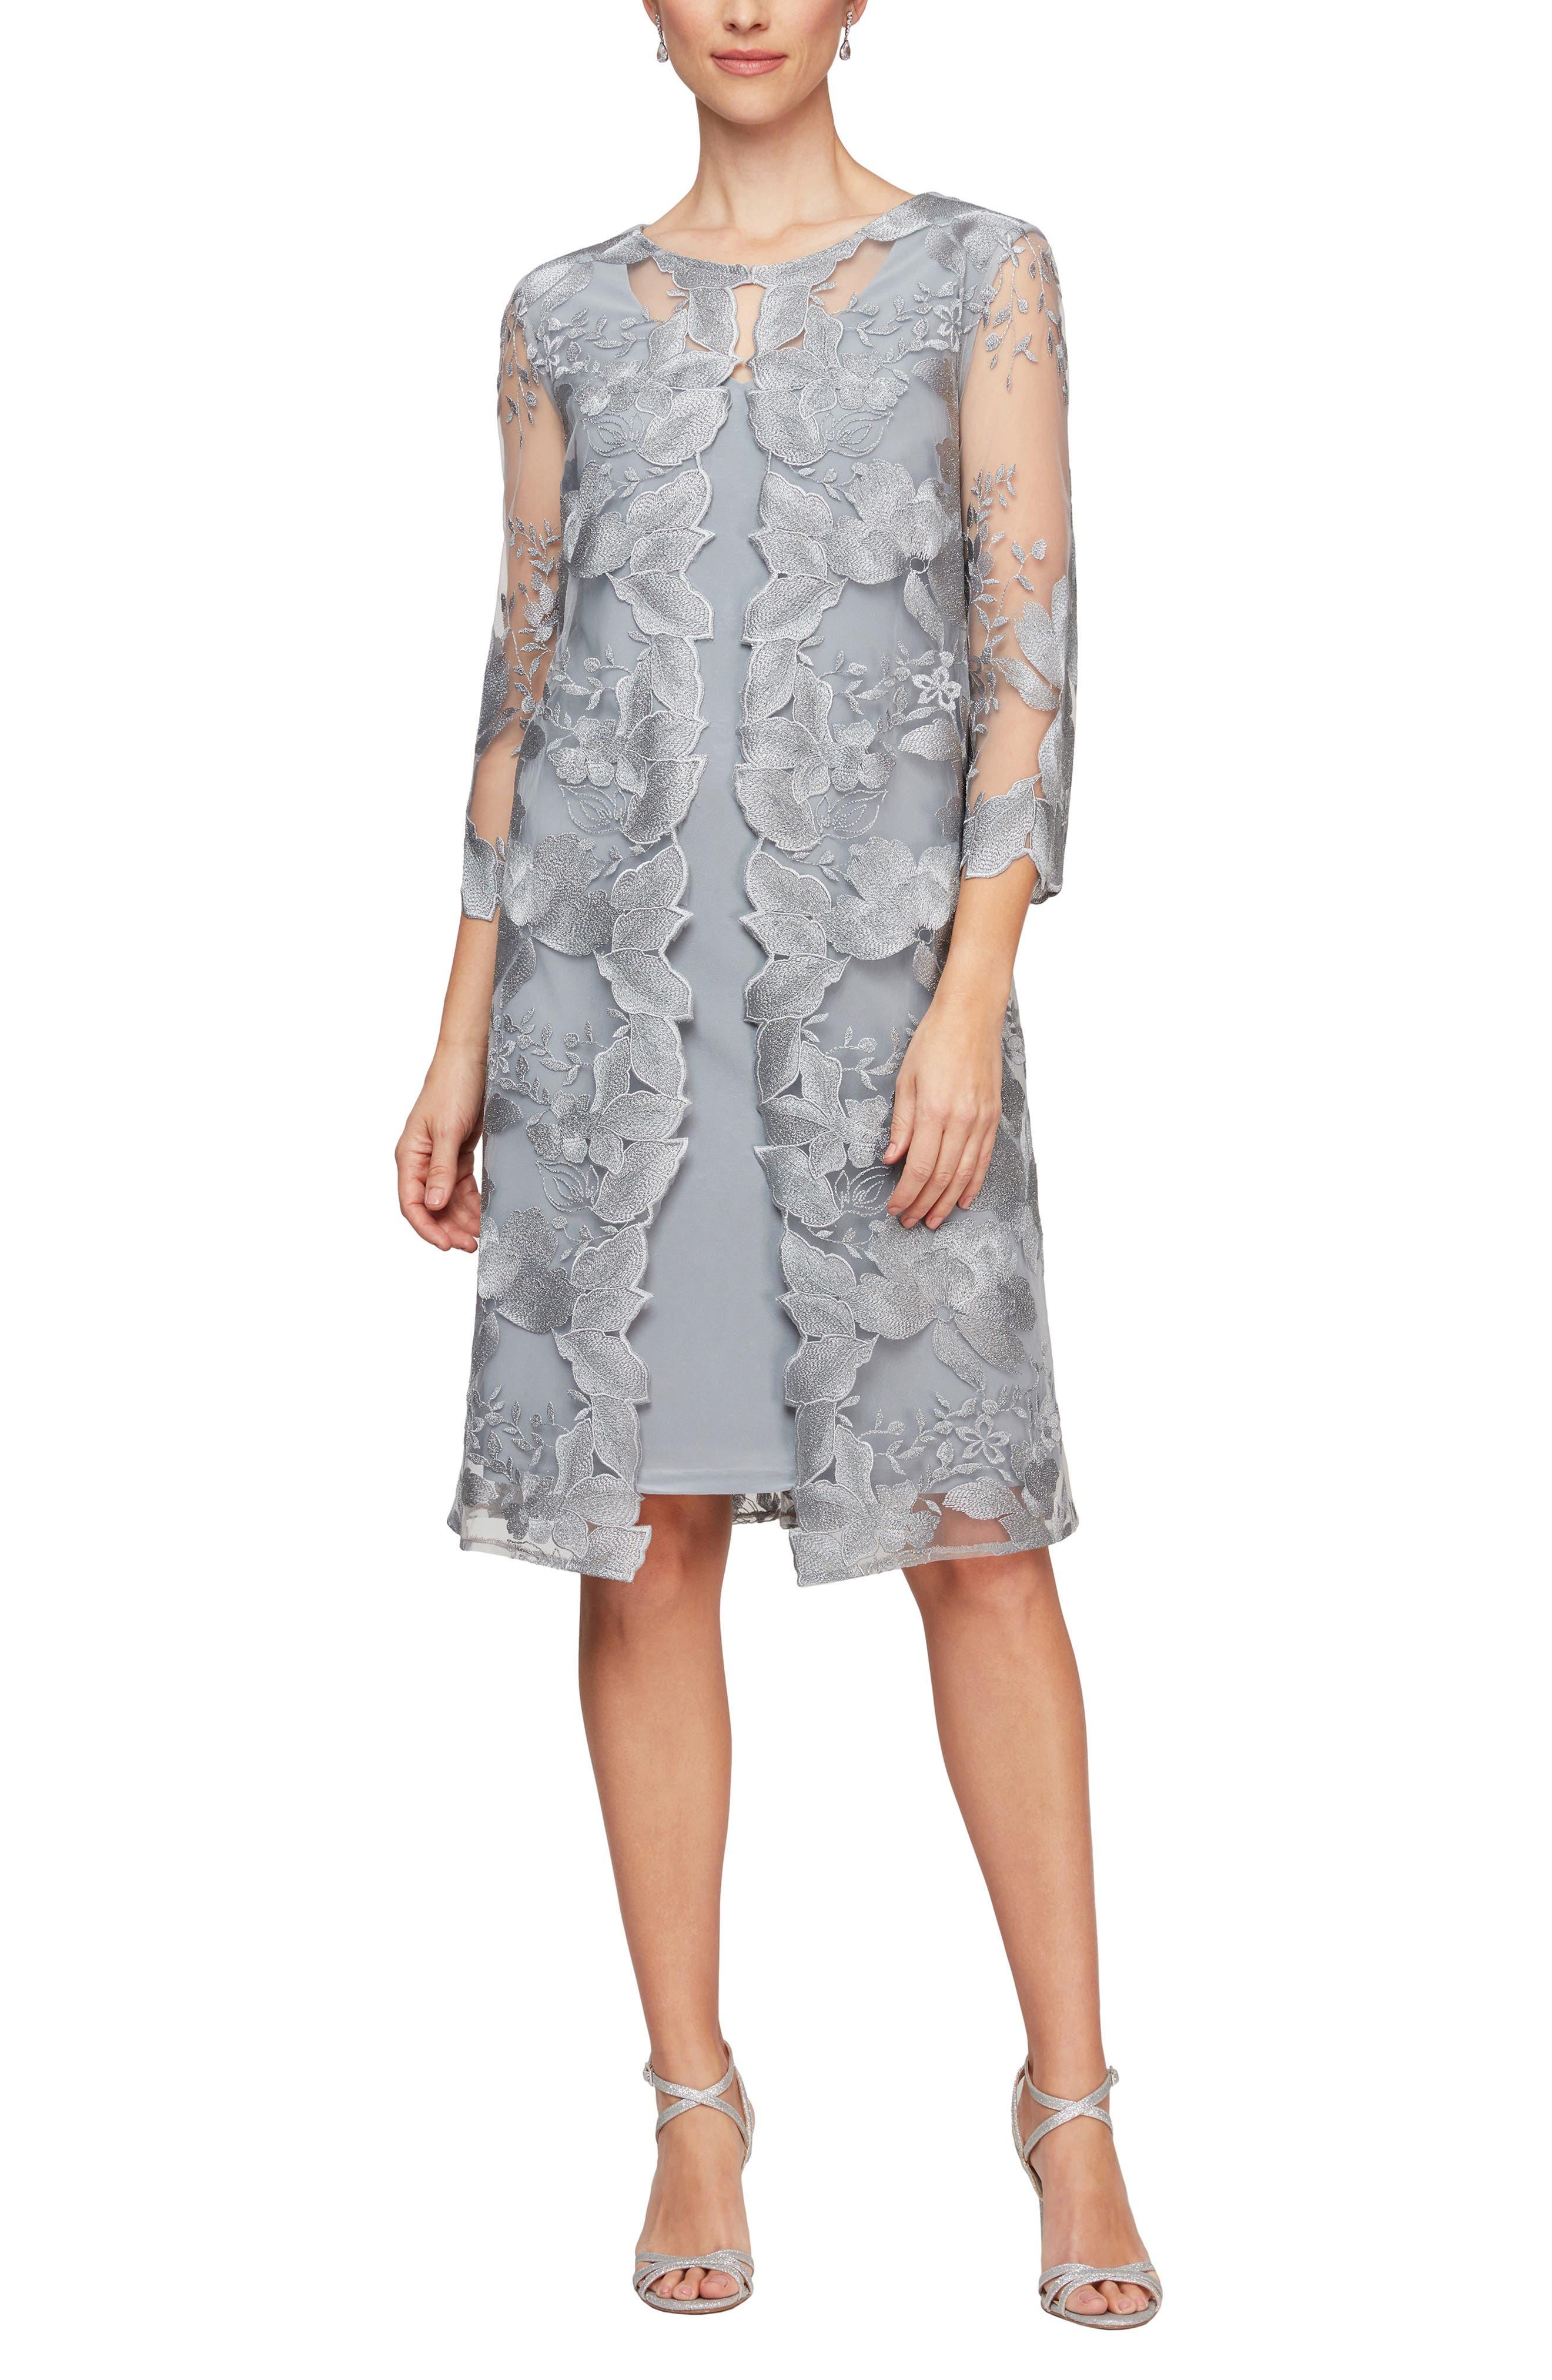 60s Dresses | 1960s Dresses Mod, Mini, Hippie Womens Alex Evenings Embroidered Mock Jacket Cocktail Dress Size 18 - Grey $99.50 AT vintagedancer.com